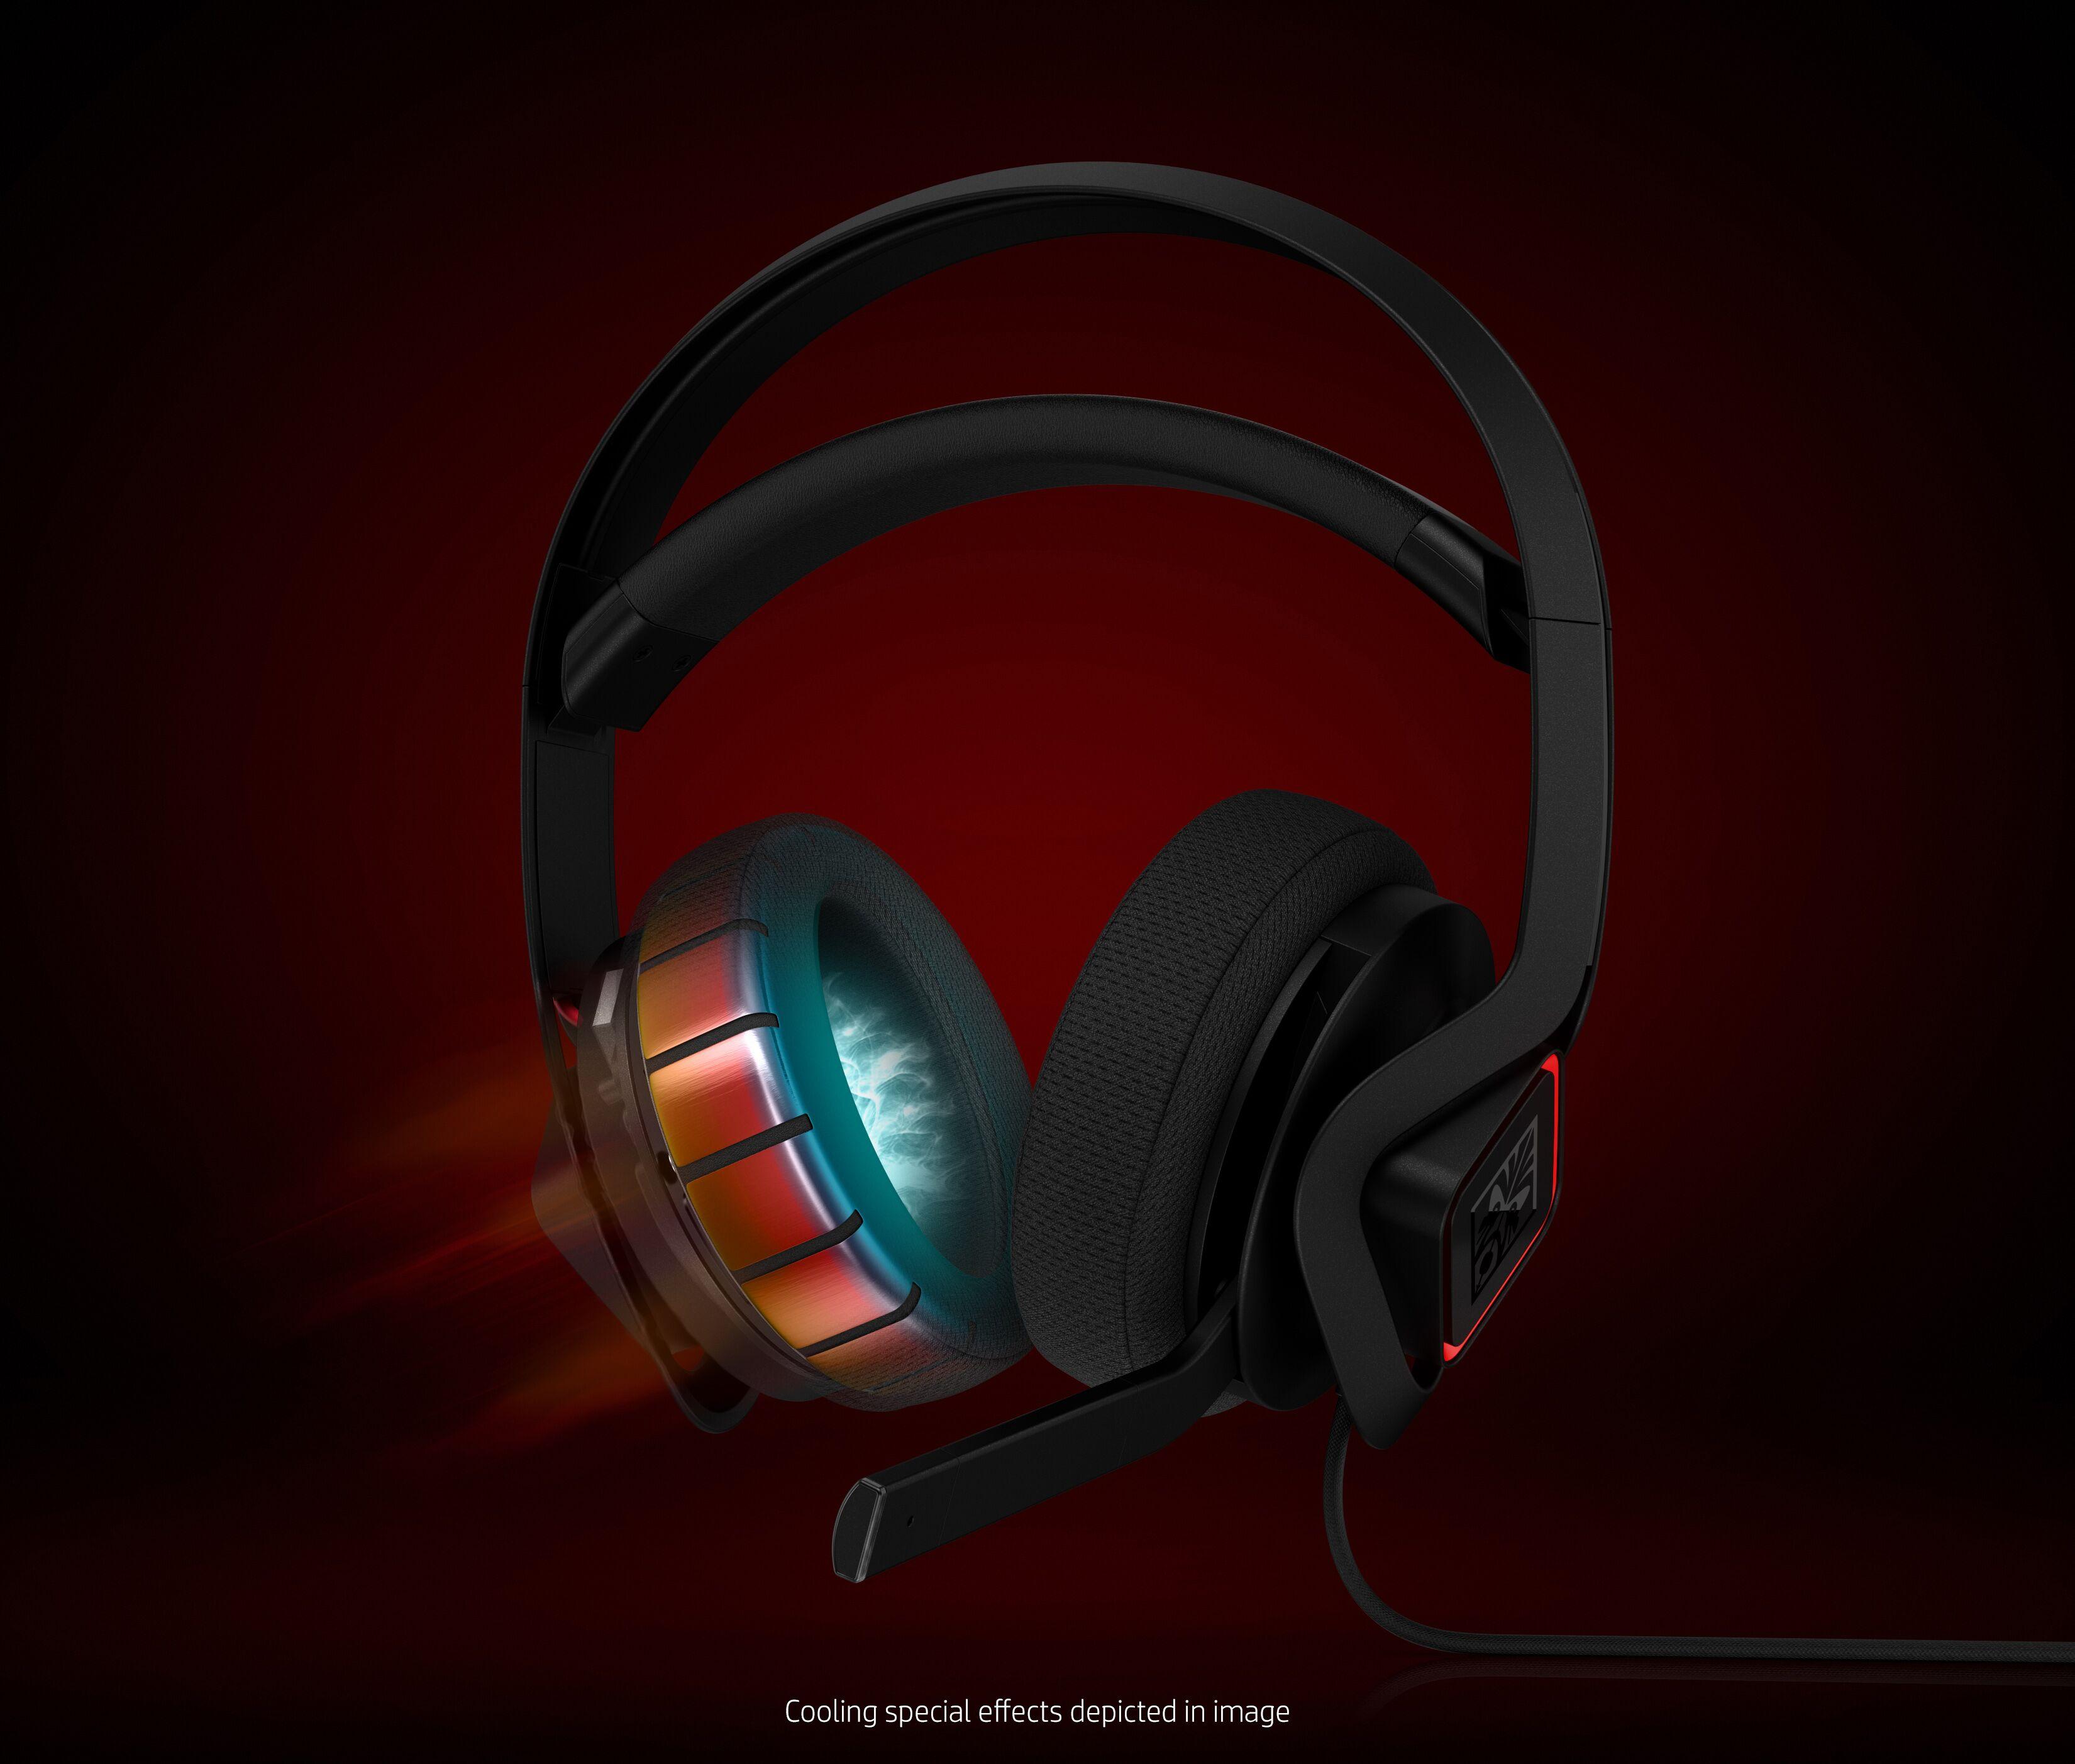 Gamescom 2019 - Mindframe Prime Headset 11 - Hynerd.it